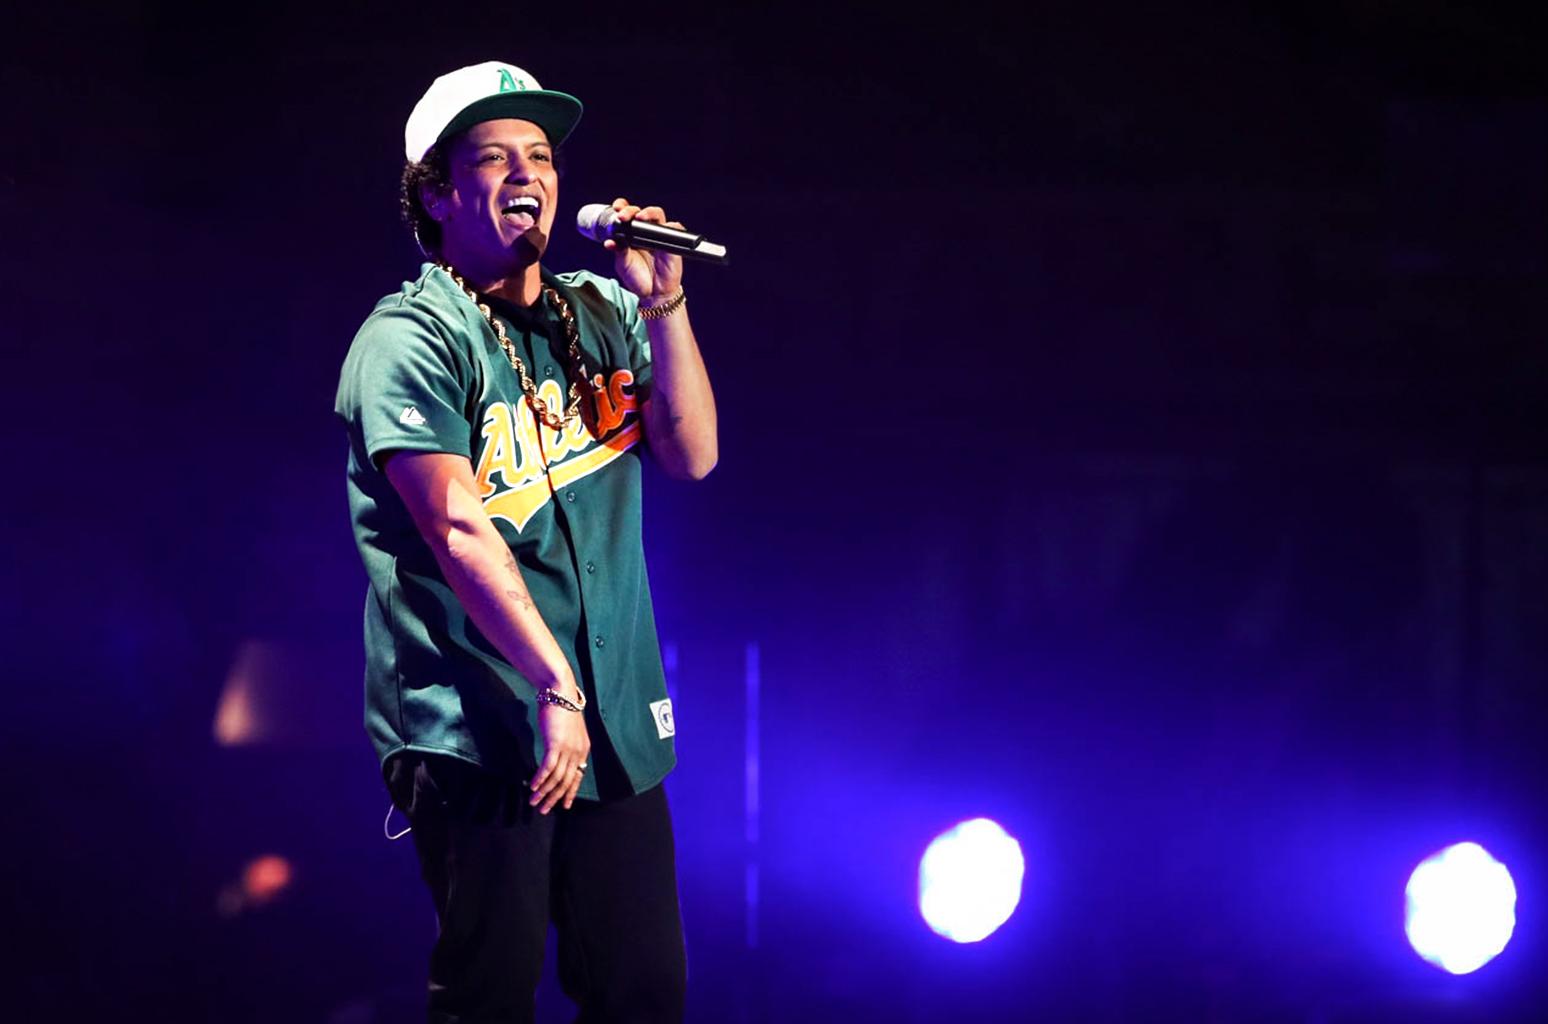 Bruno Mars Slays at Pre-Super Bowl Concert in Houston | Billboard